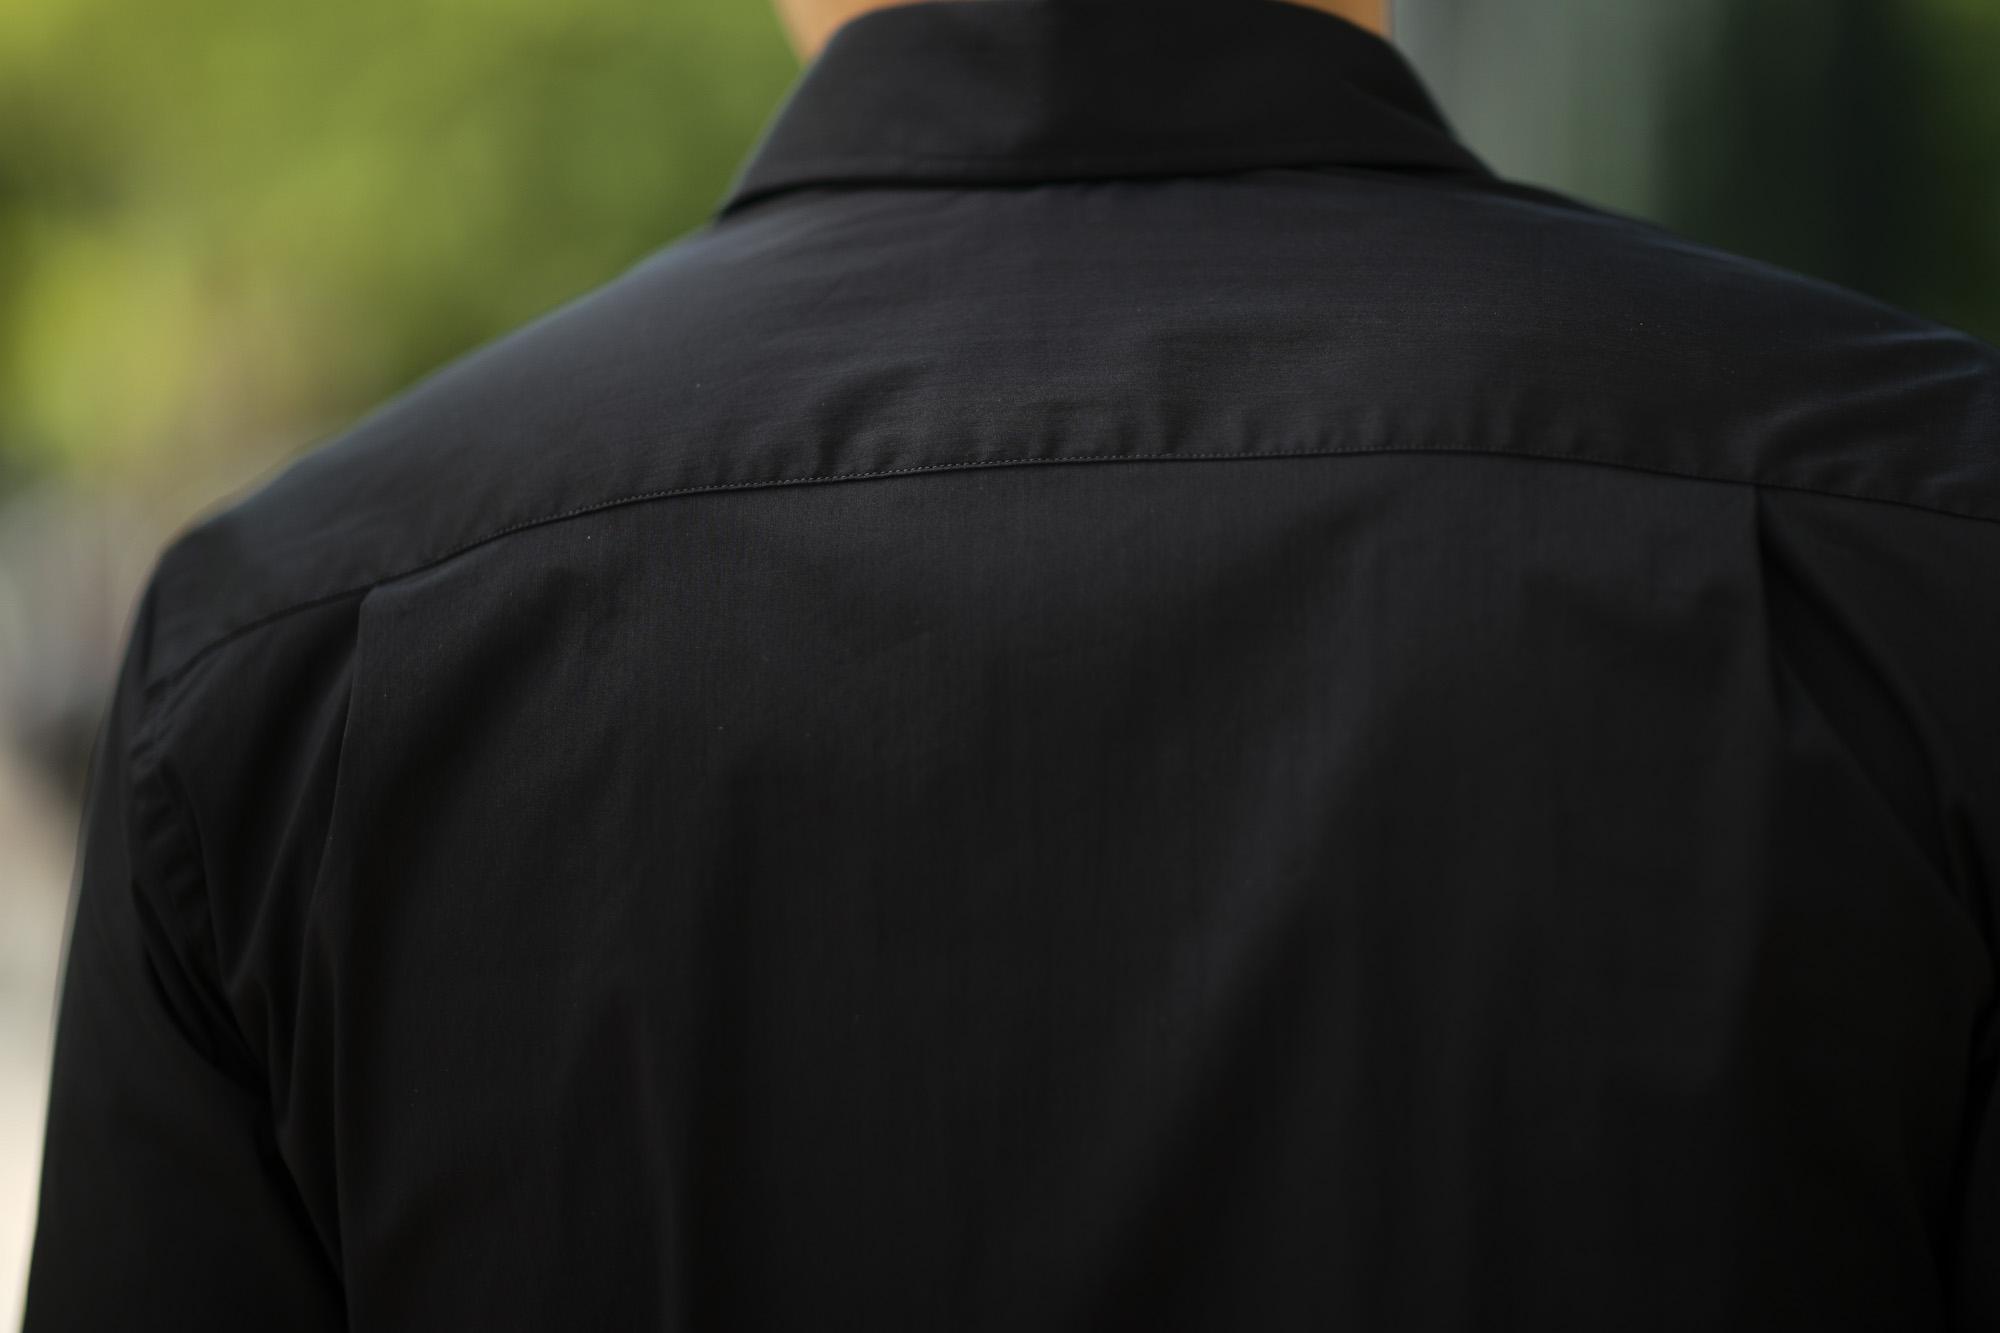 Cuervo クエルボ Sartoria Collection Pierピエル STRETCH COTTON ストレッチコットン シャツ BLACK ブラック イタリア製 2019 春夏 新色ブラック入荷 イタリアシャツ 愛知 名古屋 altoediritto アルトエデリット